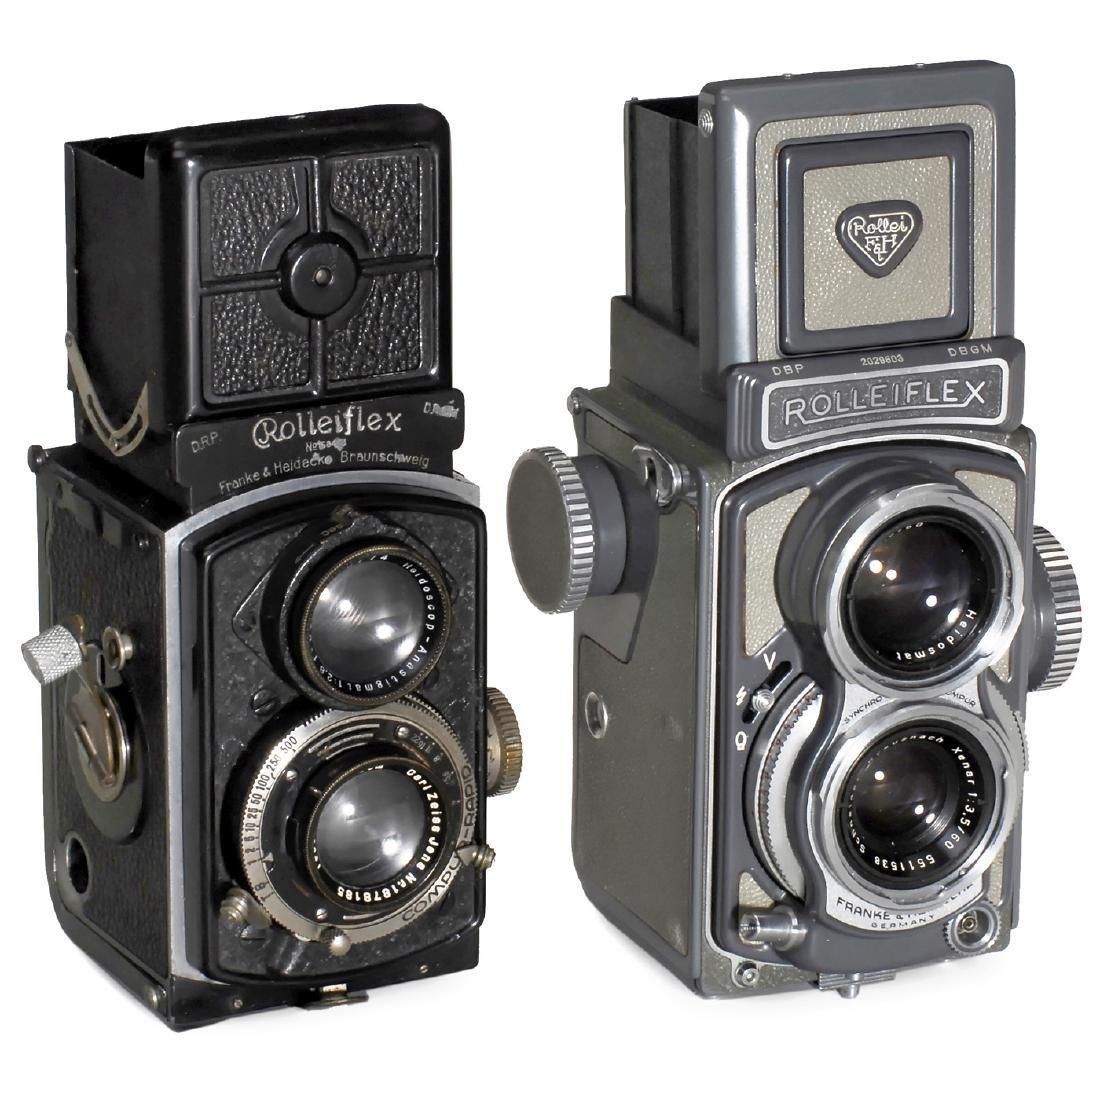 2 Rolleiflex 4 x 4 Cameras